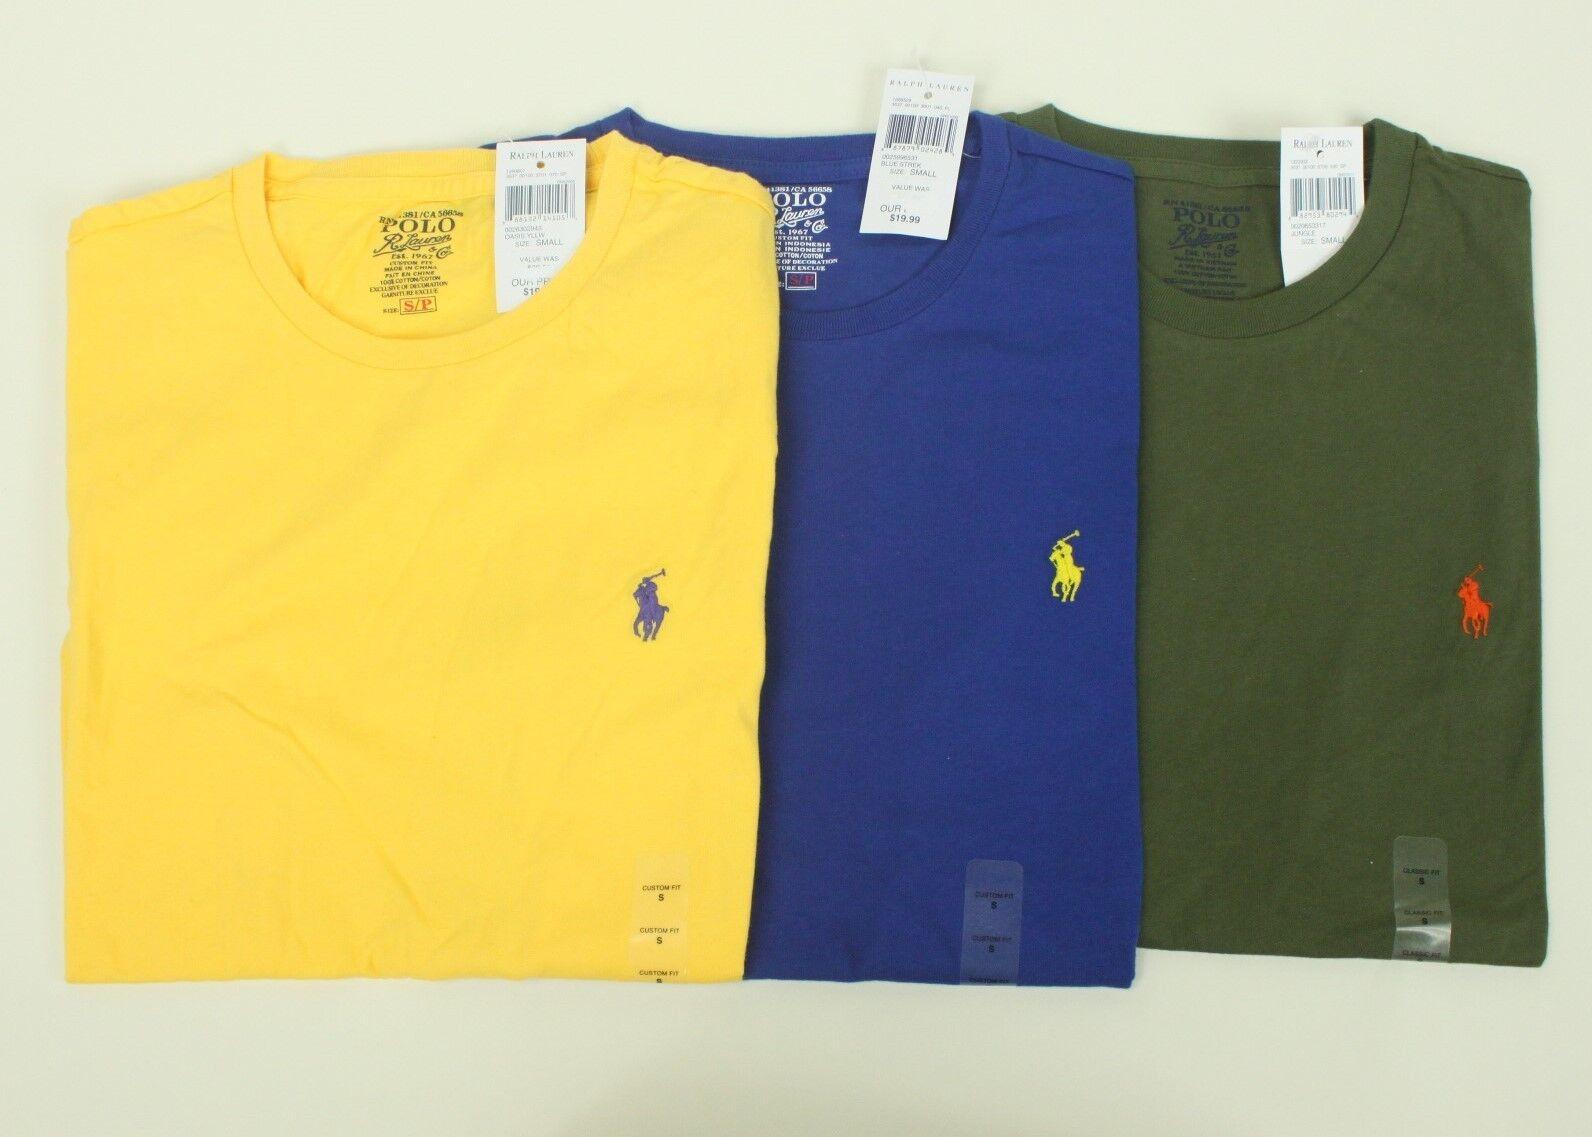 NEW (3) CUSTOM Classic Fit Polo Ralph Lauren T-Shirt Small S Gelb Blau Grün